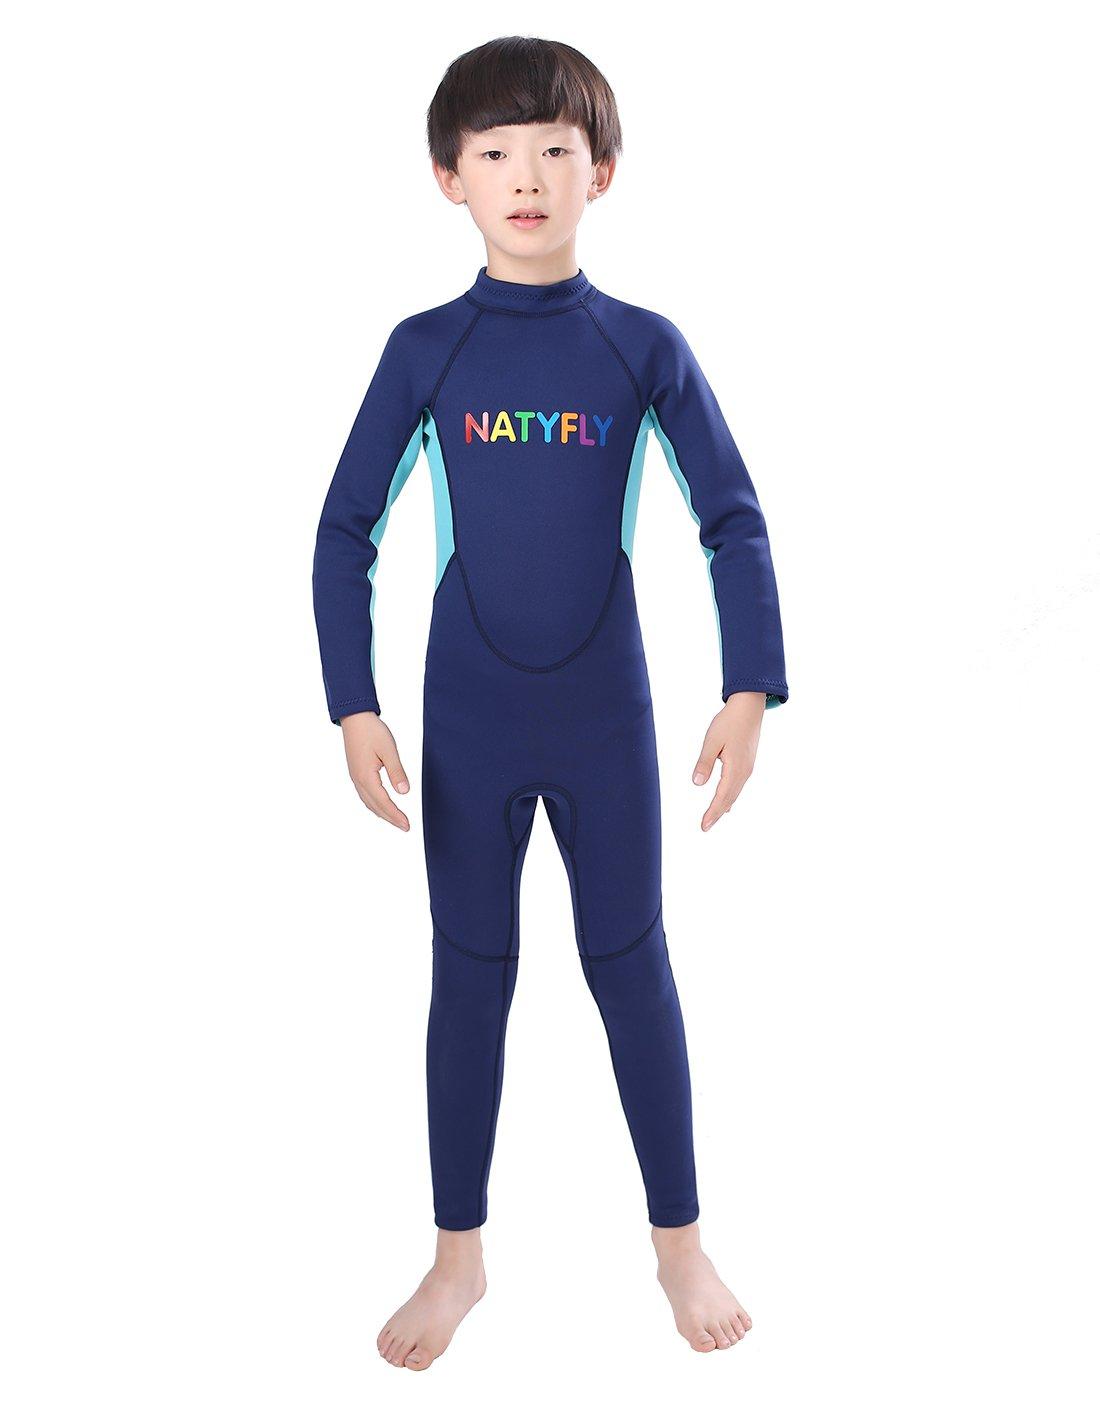 NATYFLY Neoprene Wetsuits for Kids Boys Girls Back Zipper One Piece Swimsuit UV Protection Brand